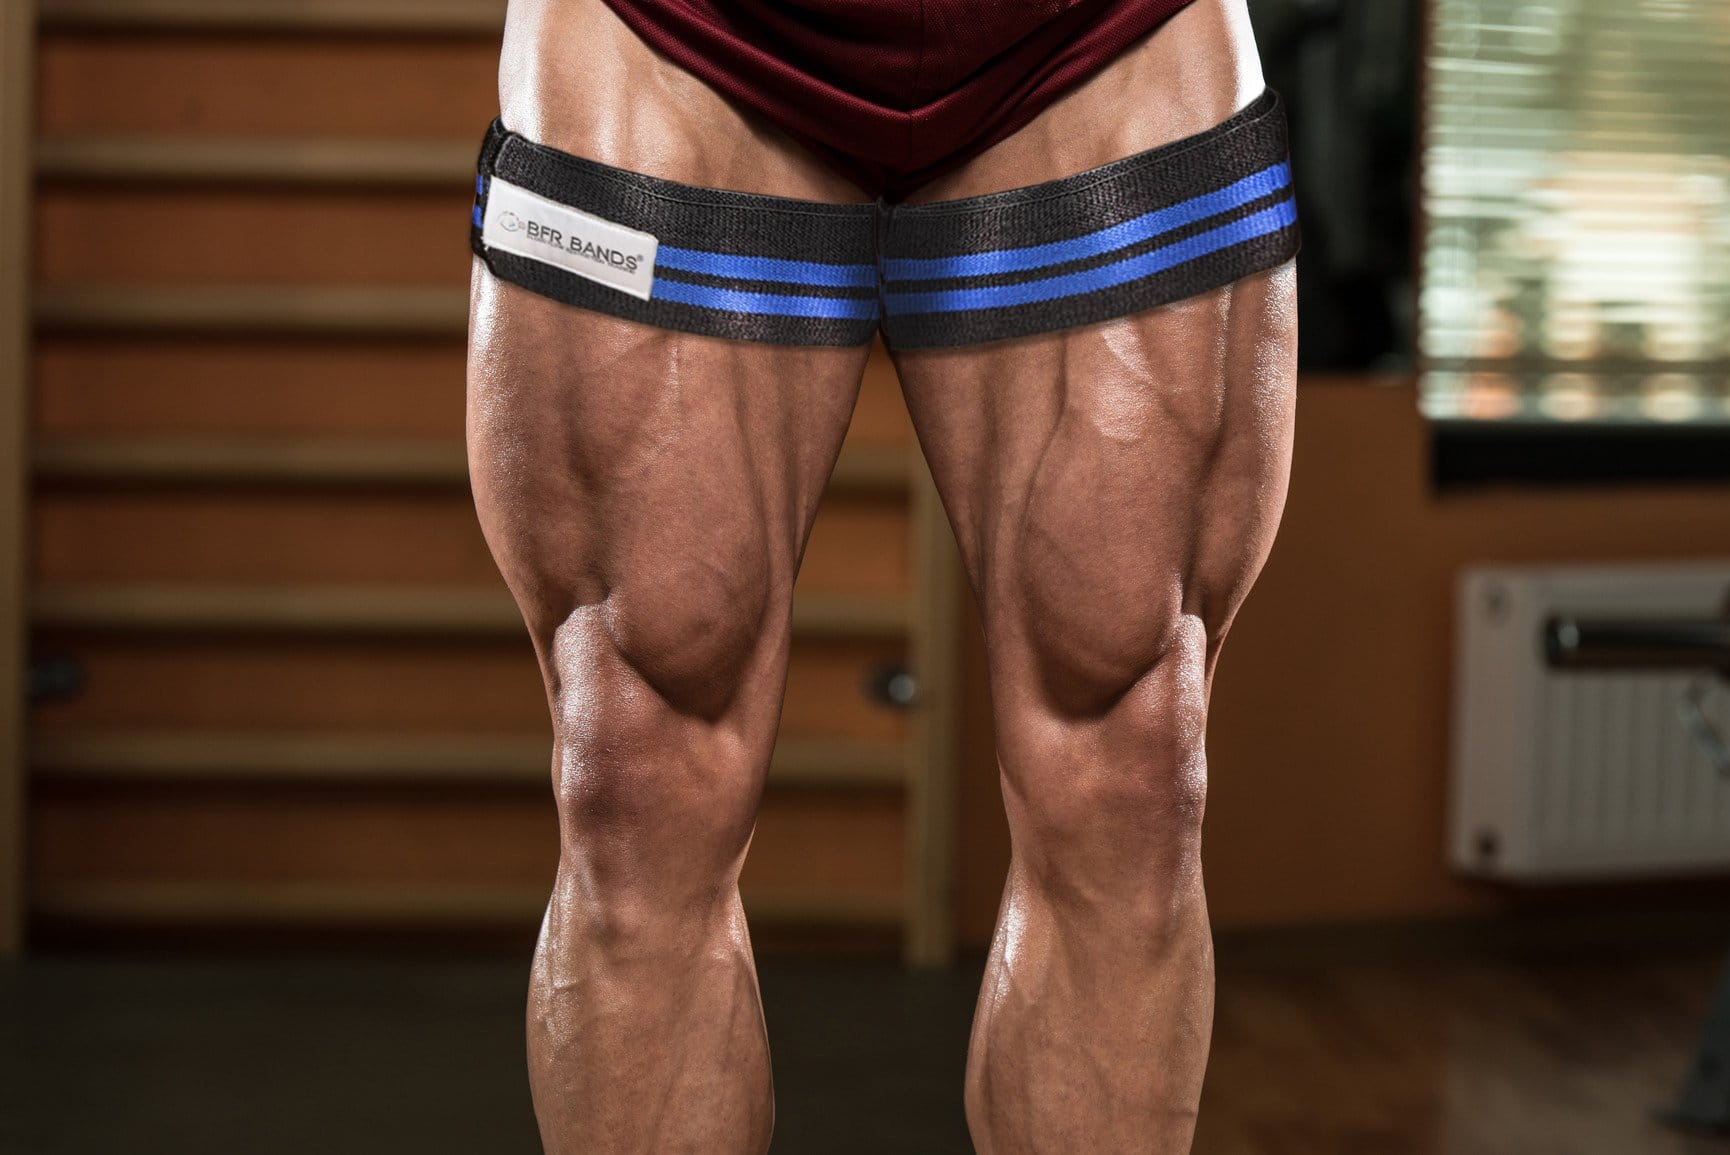 BFR legs